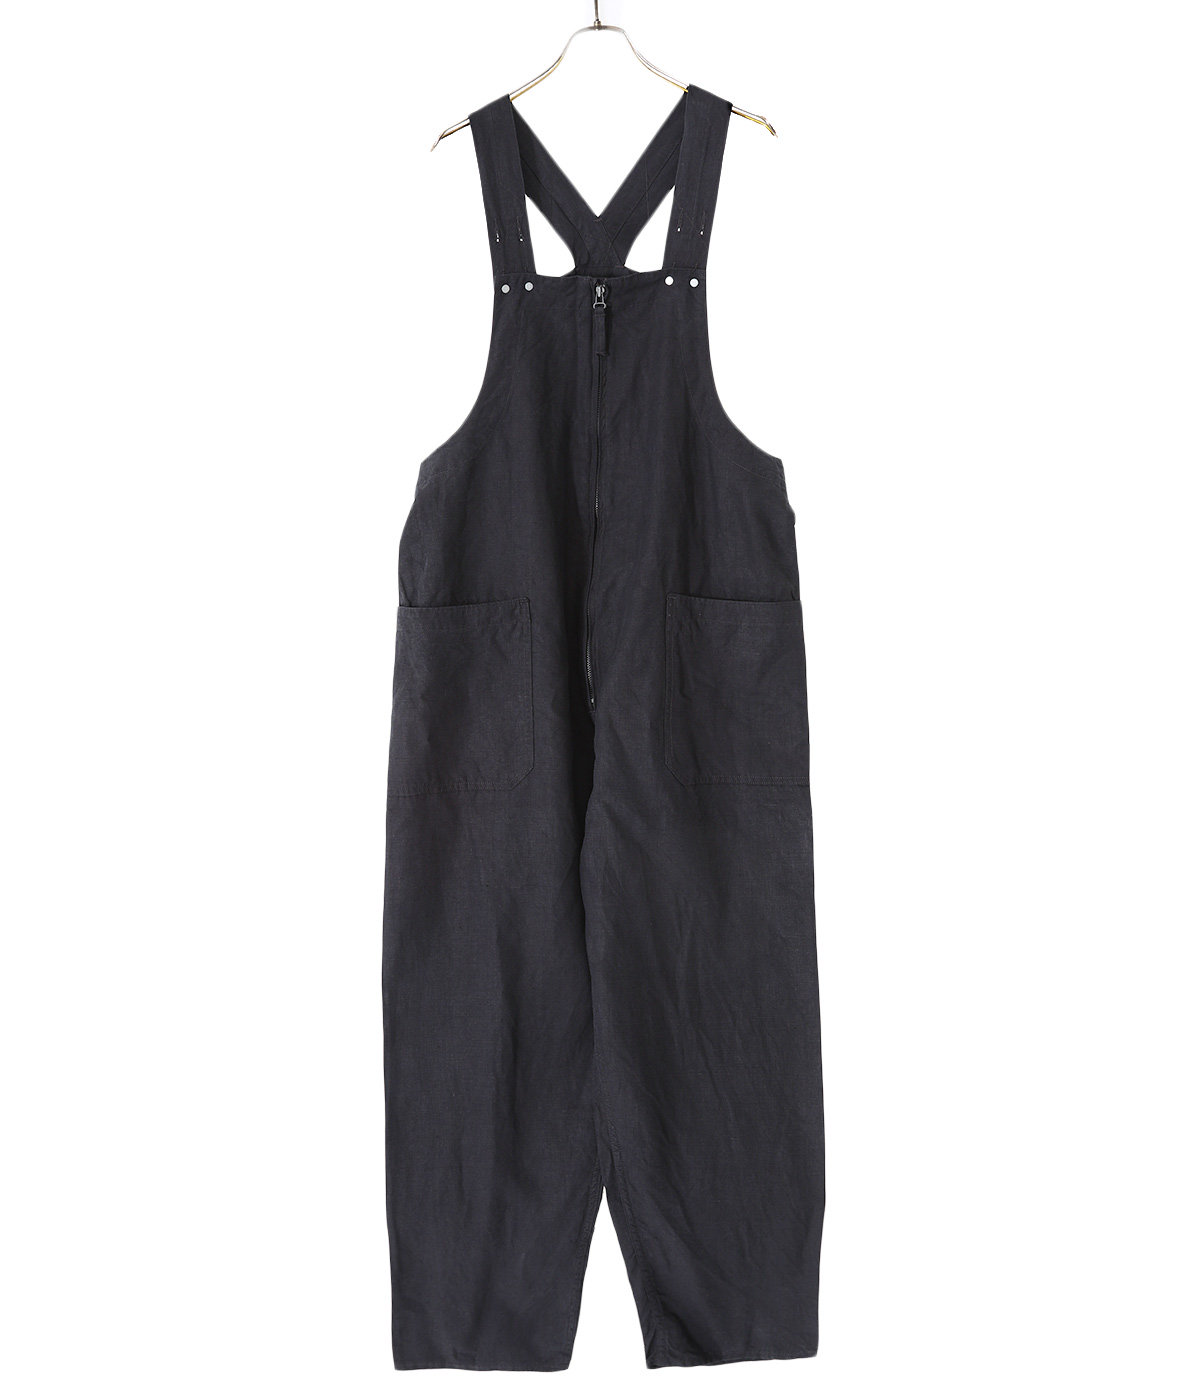 【予約】Deck Trousers